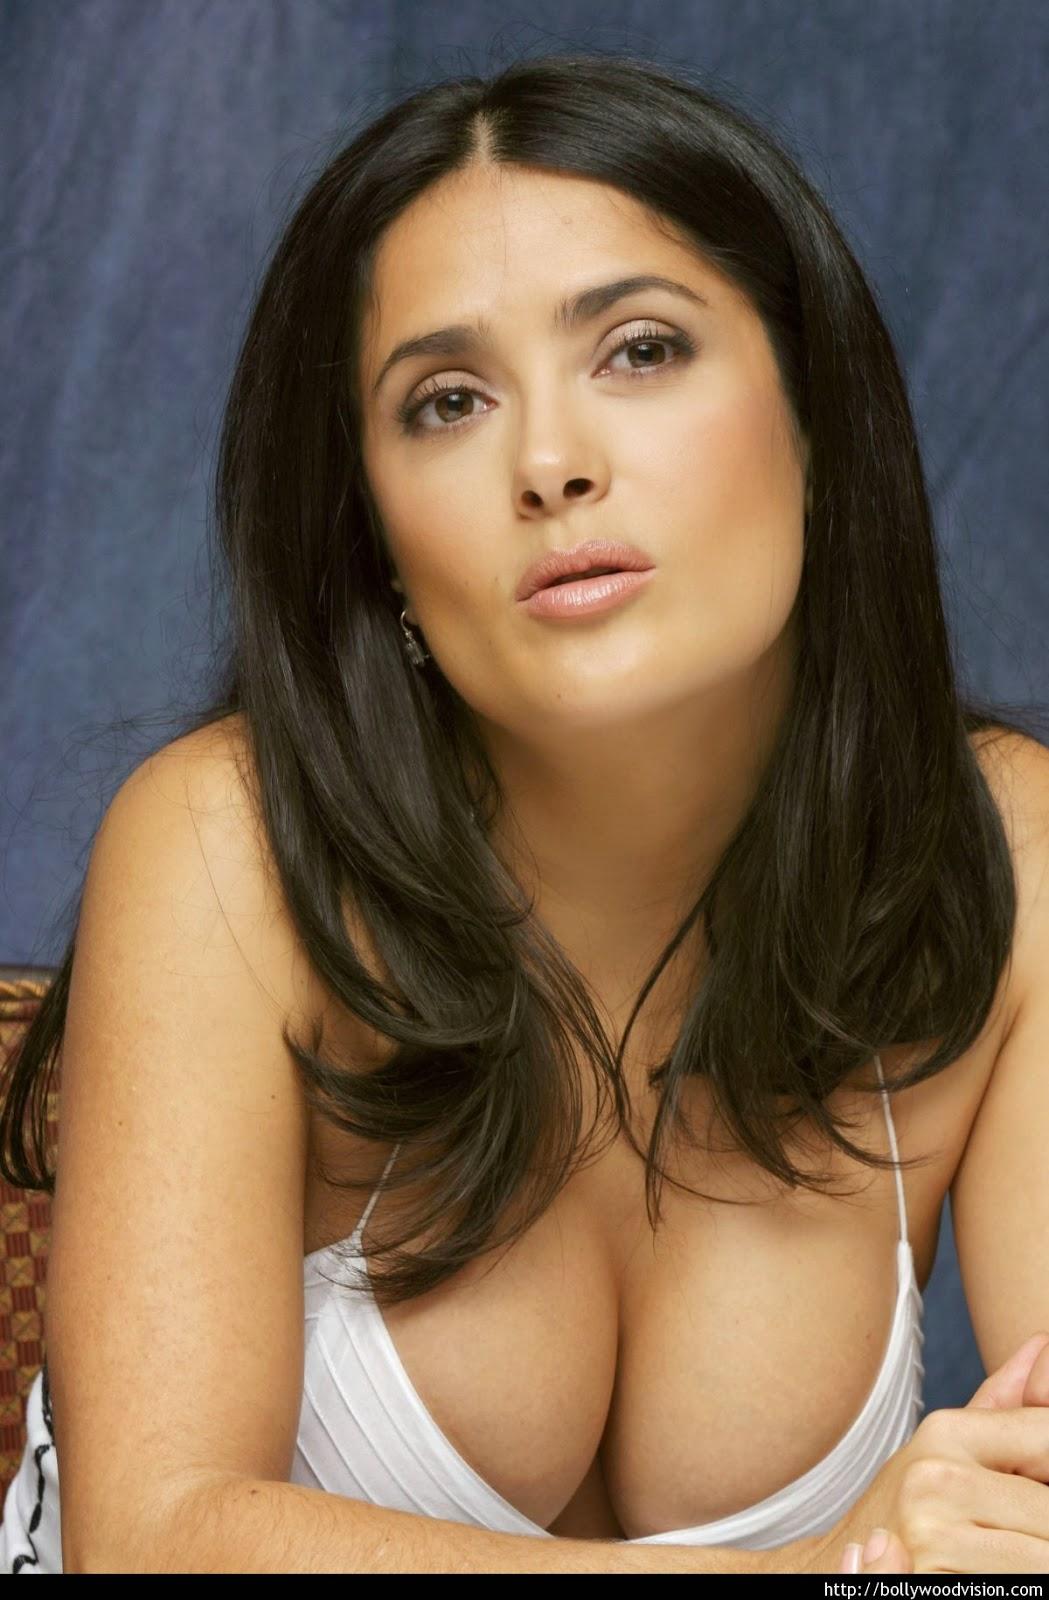 Hot Celebrity Amazing: Salma Hayek Hot